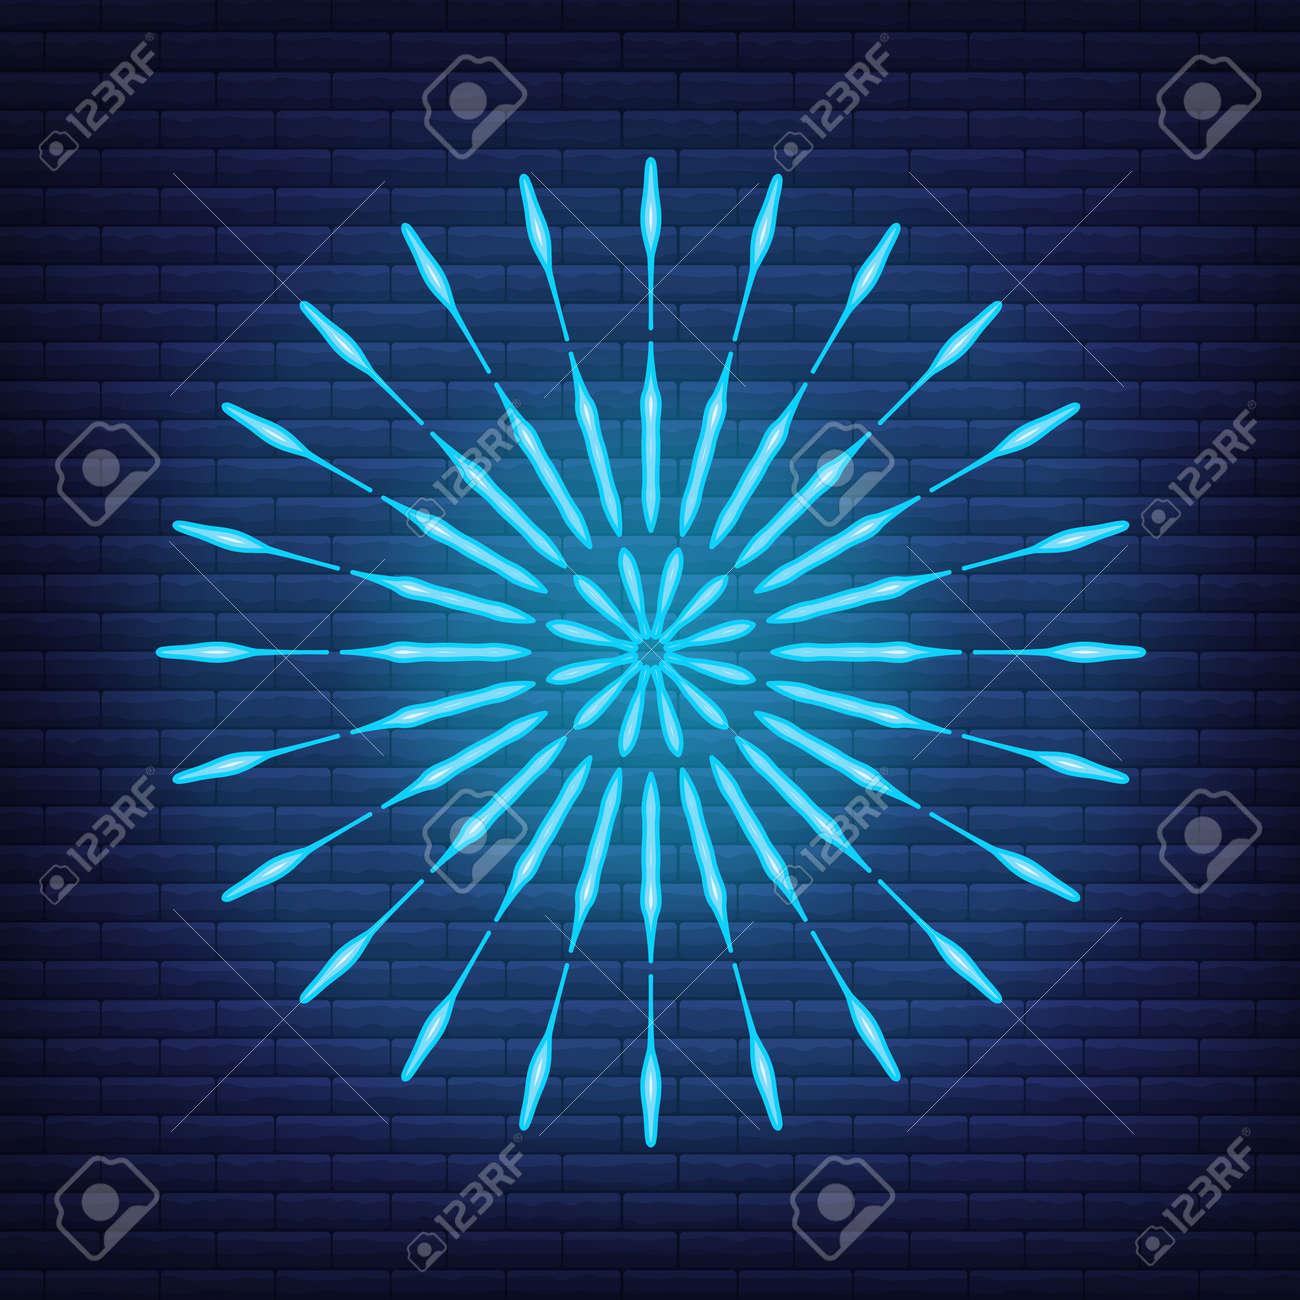 Retro design light sunburst neon style glow geometric shape, vintage rays sunlight explosion icon concept vector illustration, isolated on black wall. Minimal blue firework burst label, sunbeam badge. - 168394840